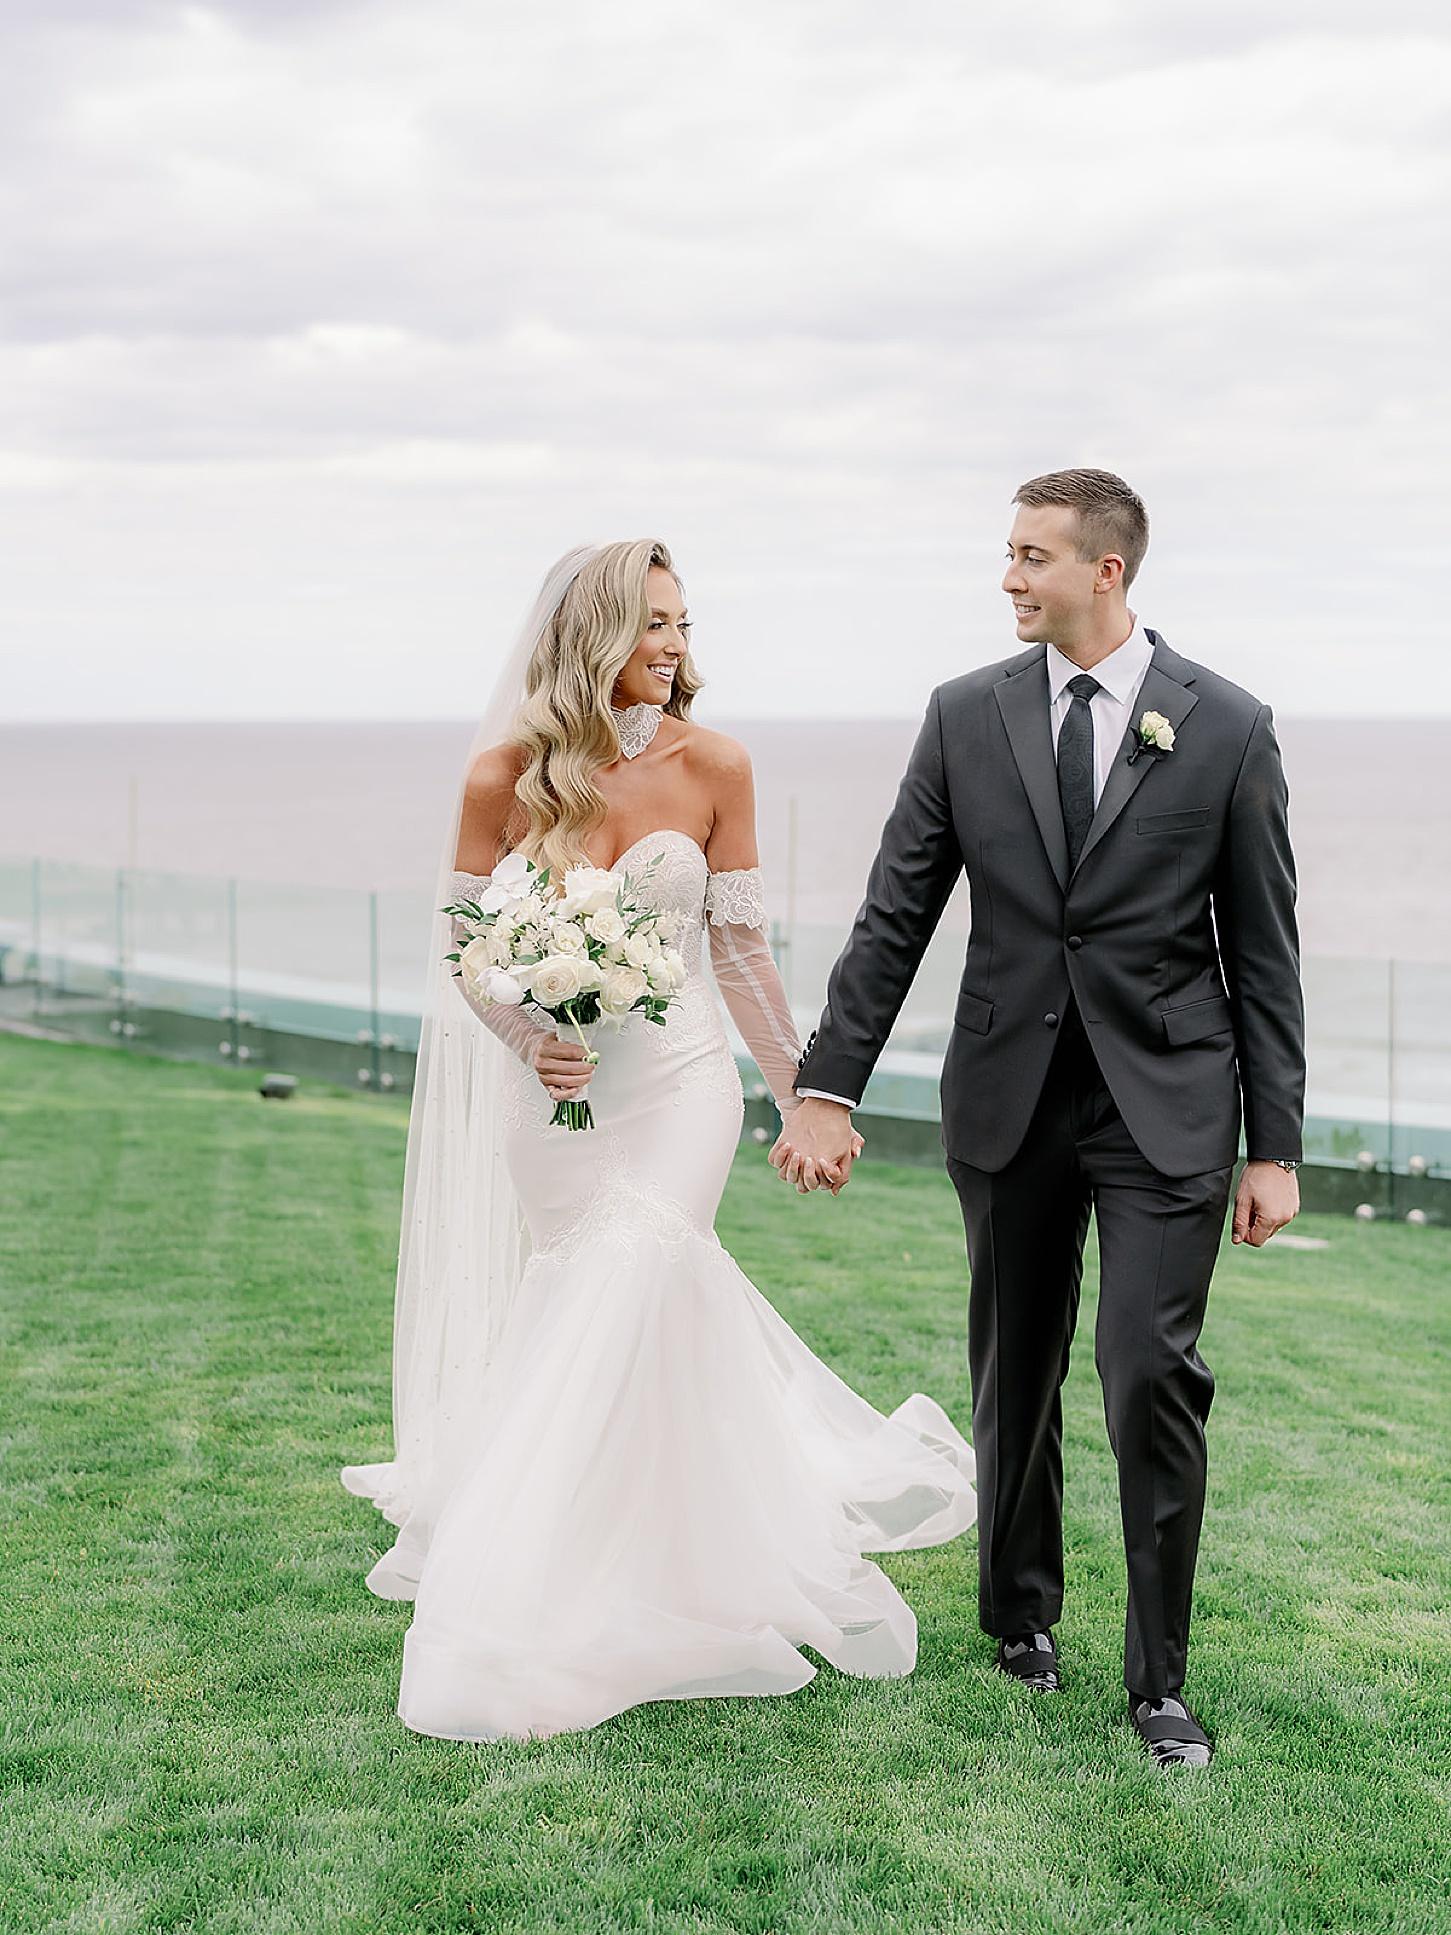 Atlantic City Wedding Photography Studio by Magdalena Studios Lexy Cha 0055